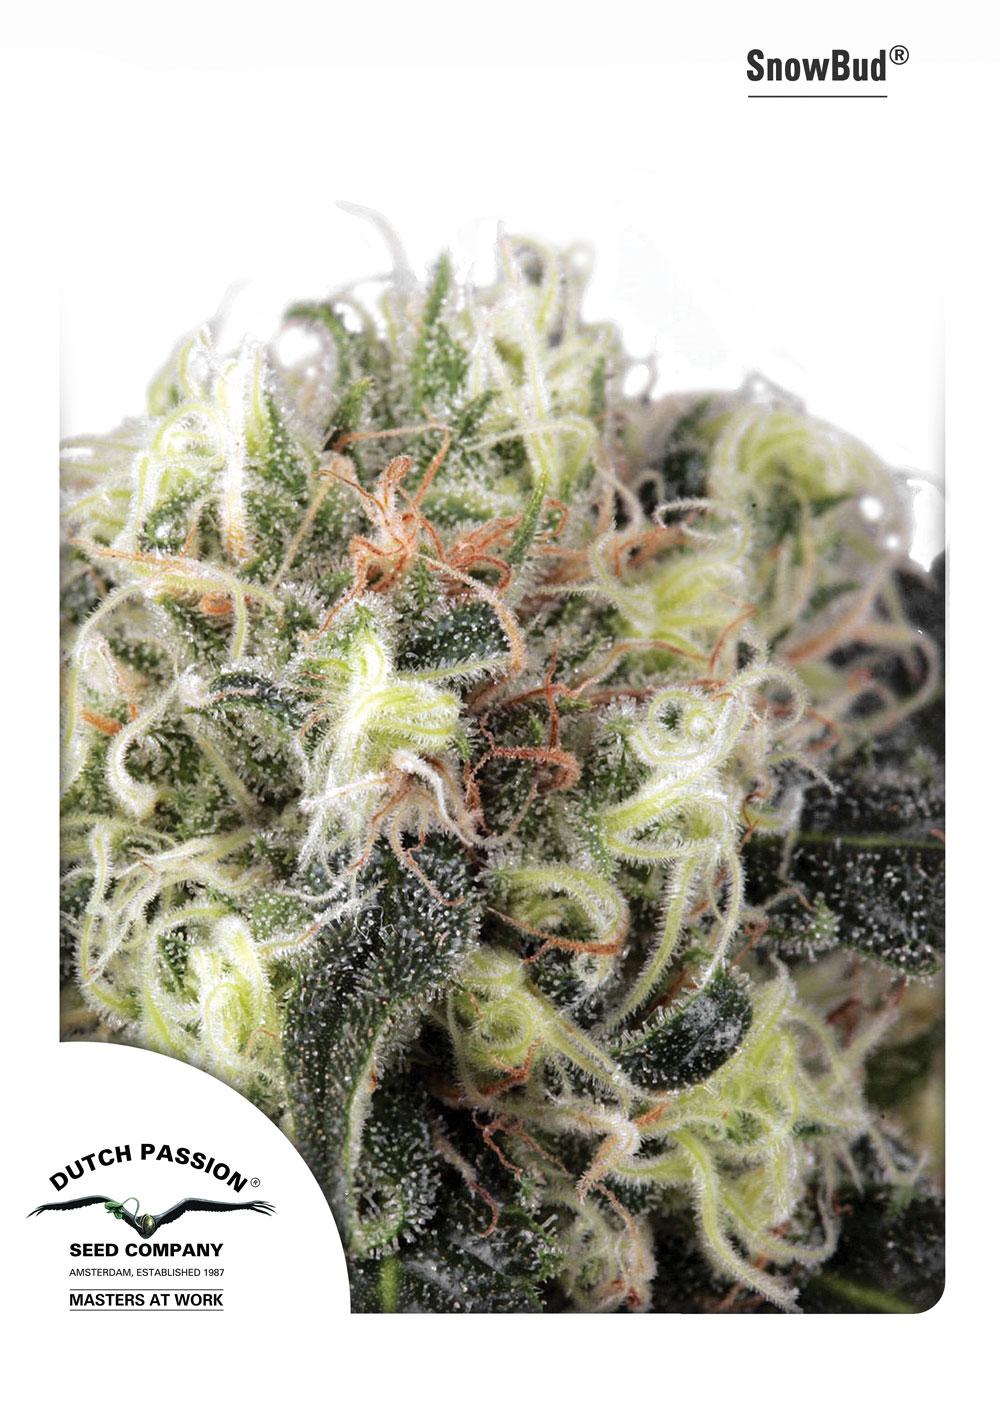 Dutch Passion Snow Bud